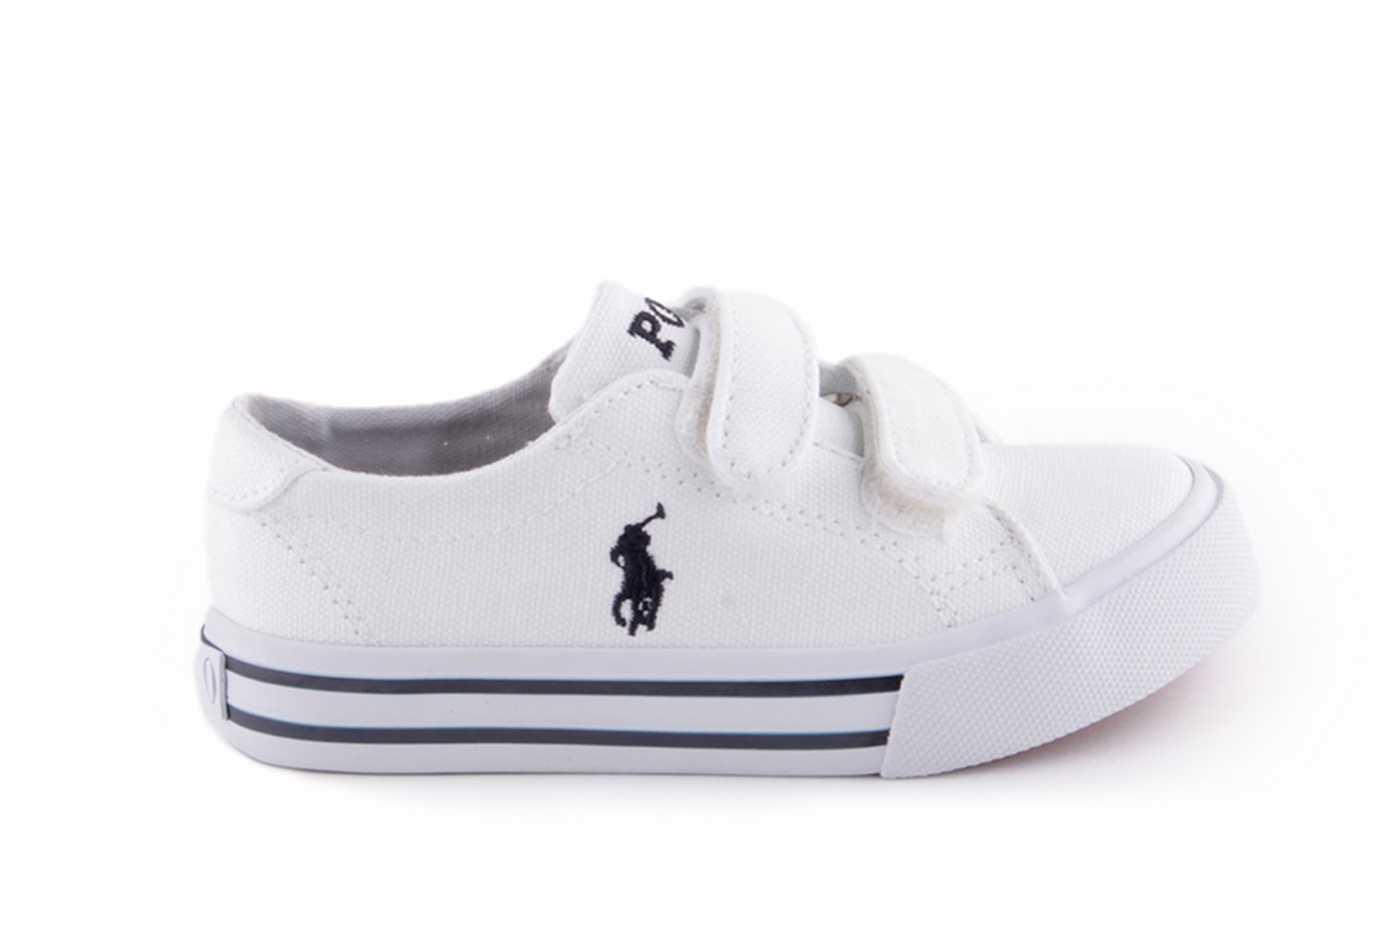 40afb2e27 Comprar zapato tipo JOVEN NIÑO estilo LONA COLOR BLANCO TEXTIL ...